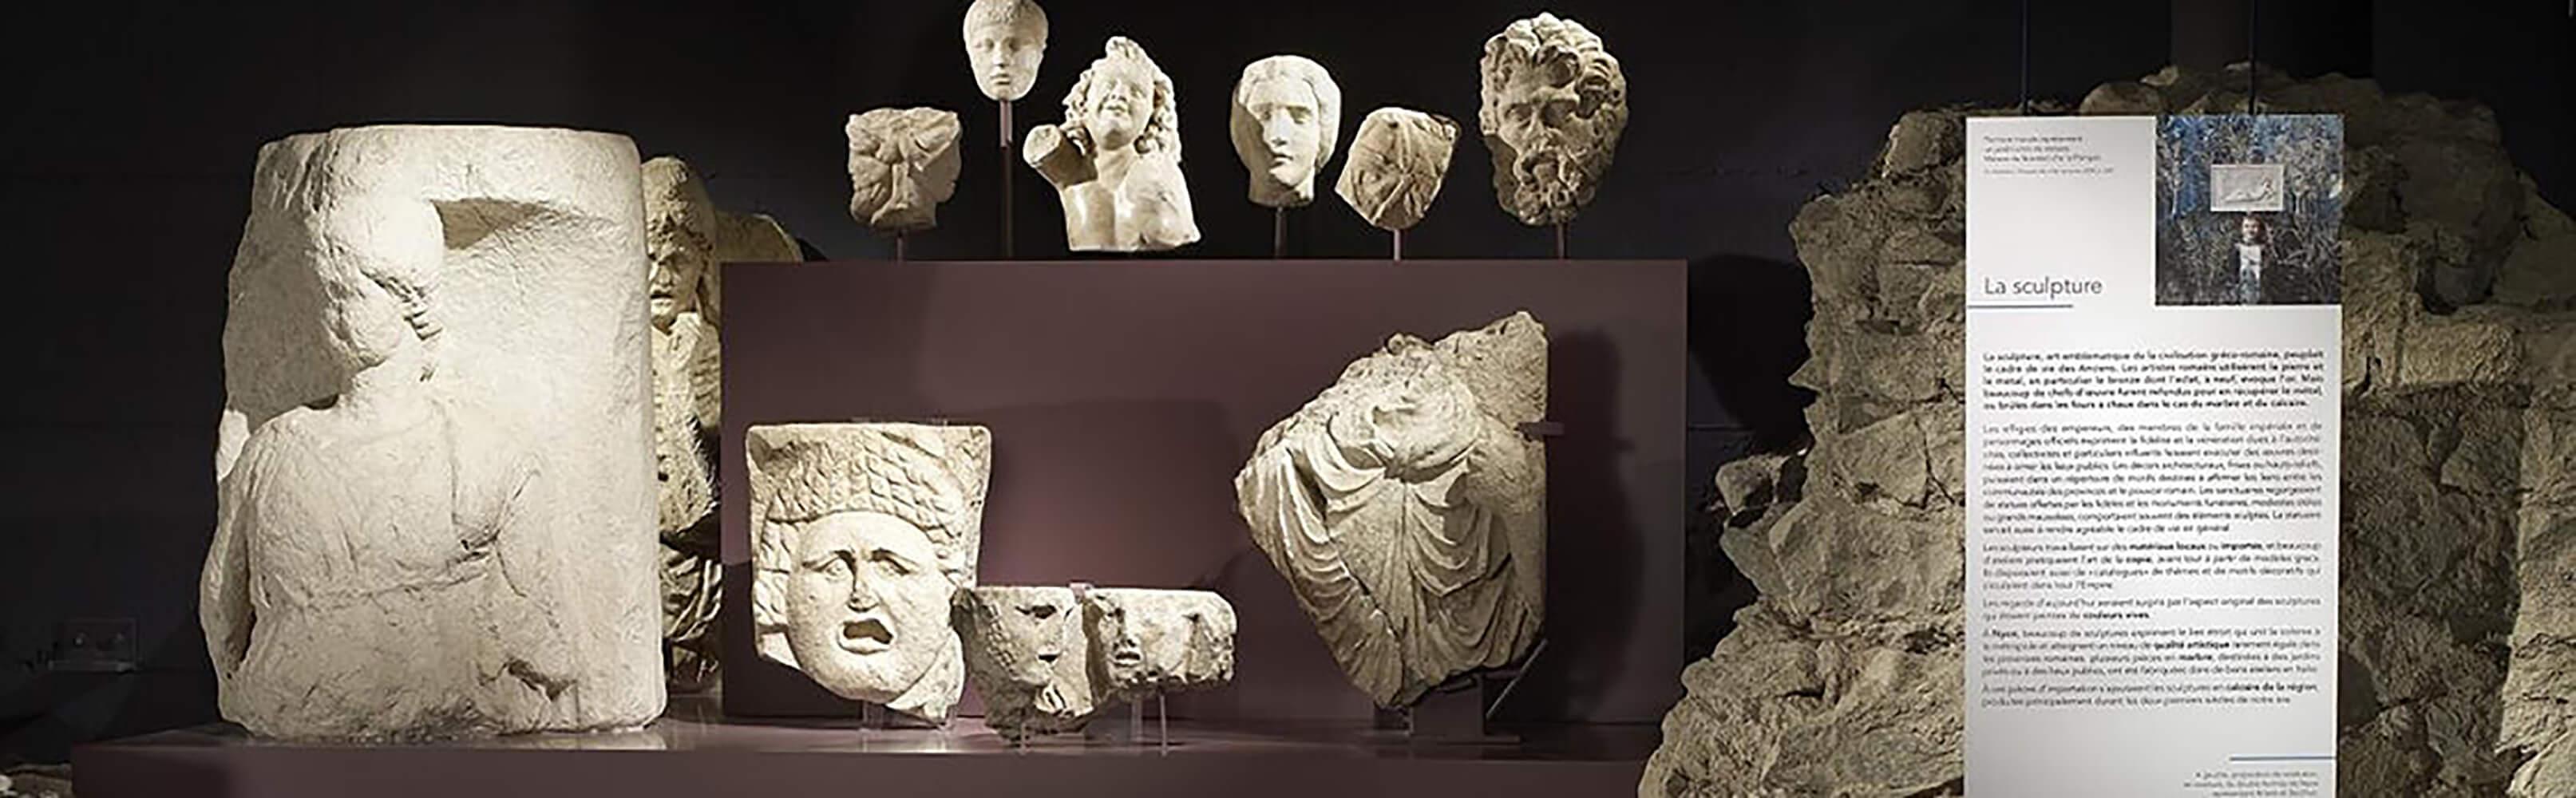 Musée romain - Römisches Museum Nyon  1